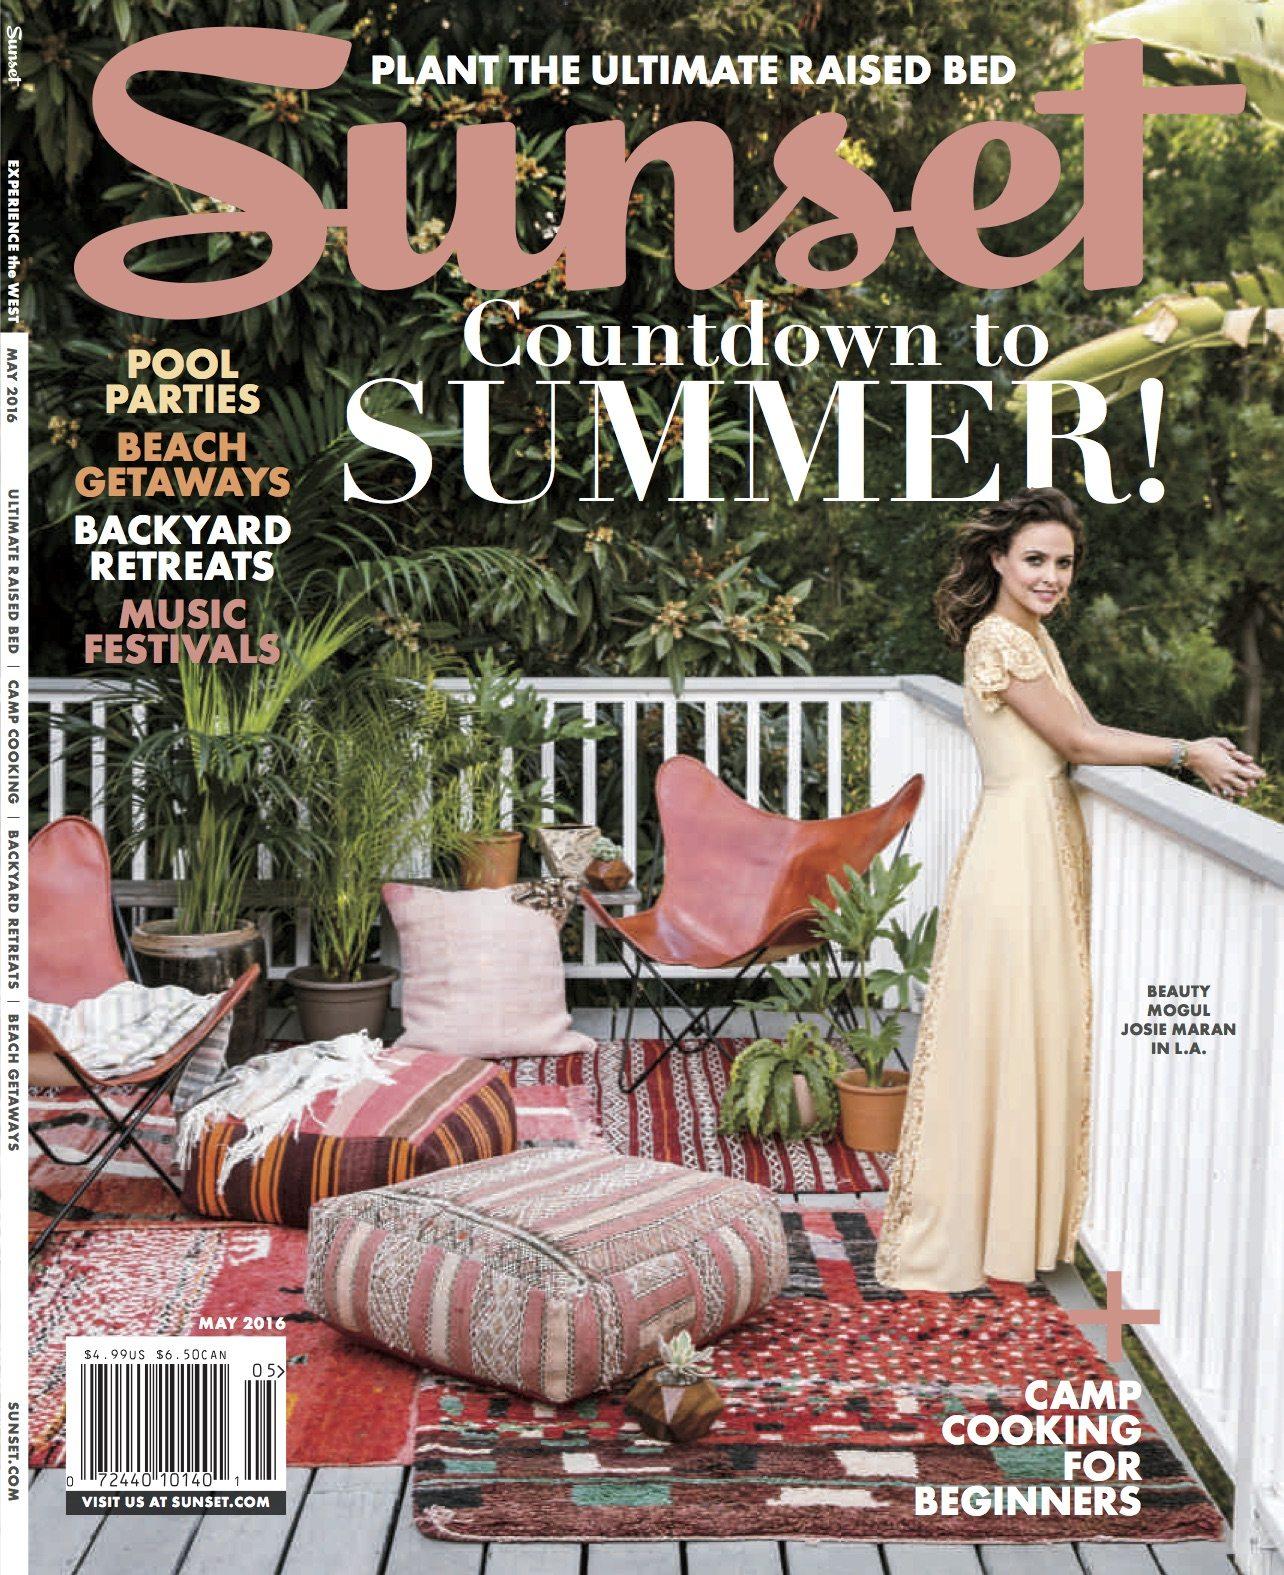 Sunset May 2016 magazine cover